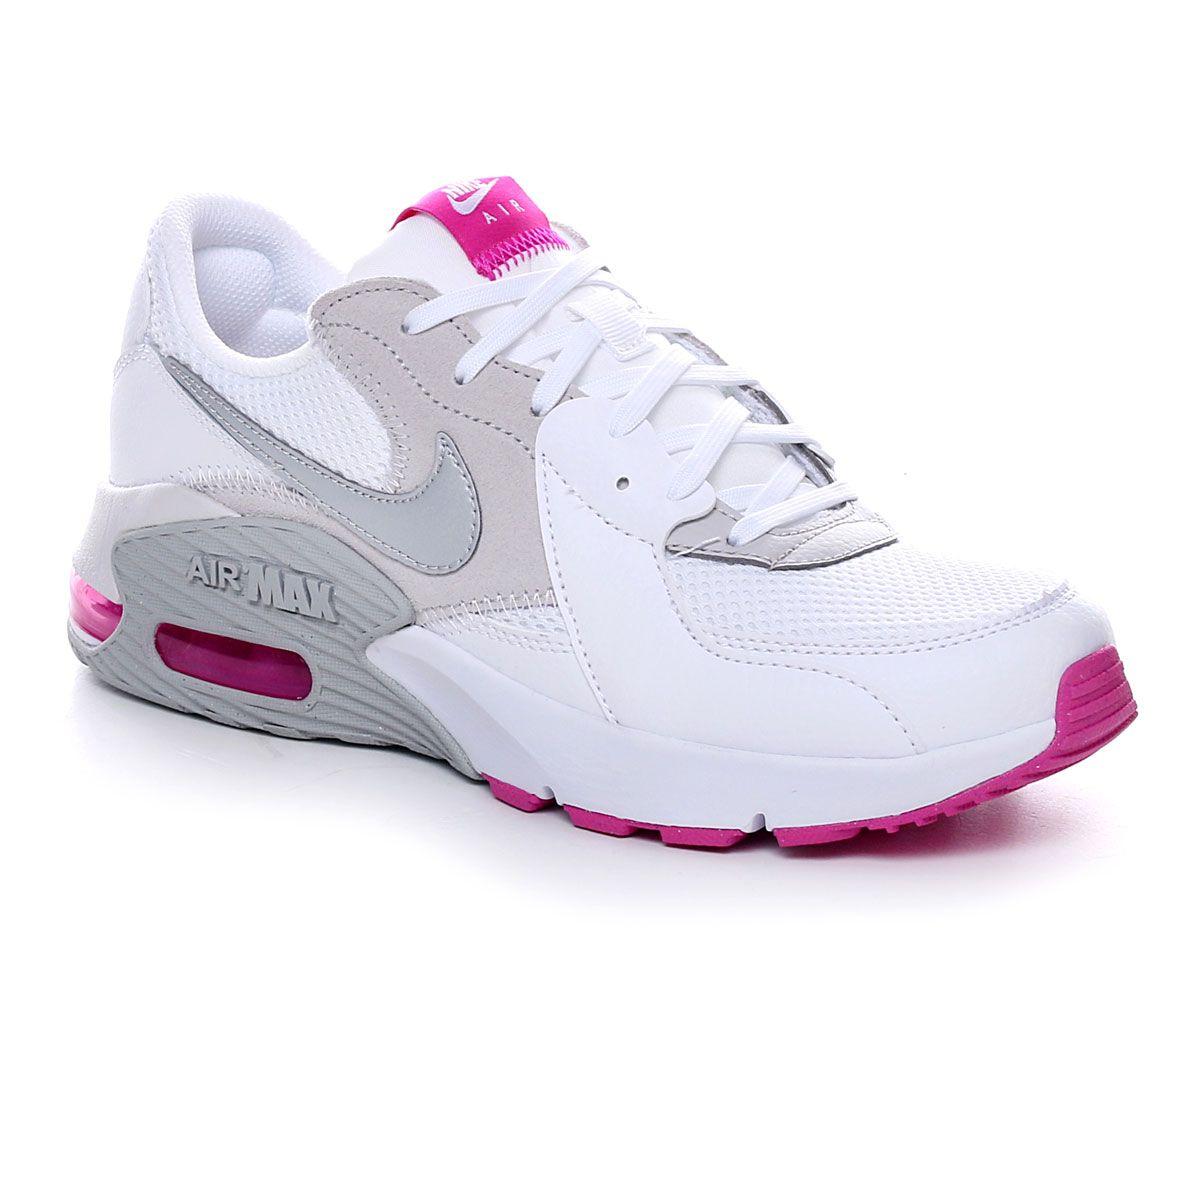 Nike Air Max Excee Donna Bianco Fucsia